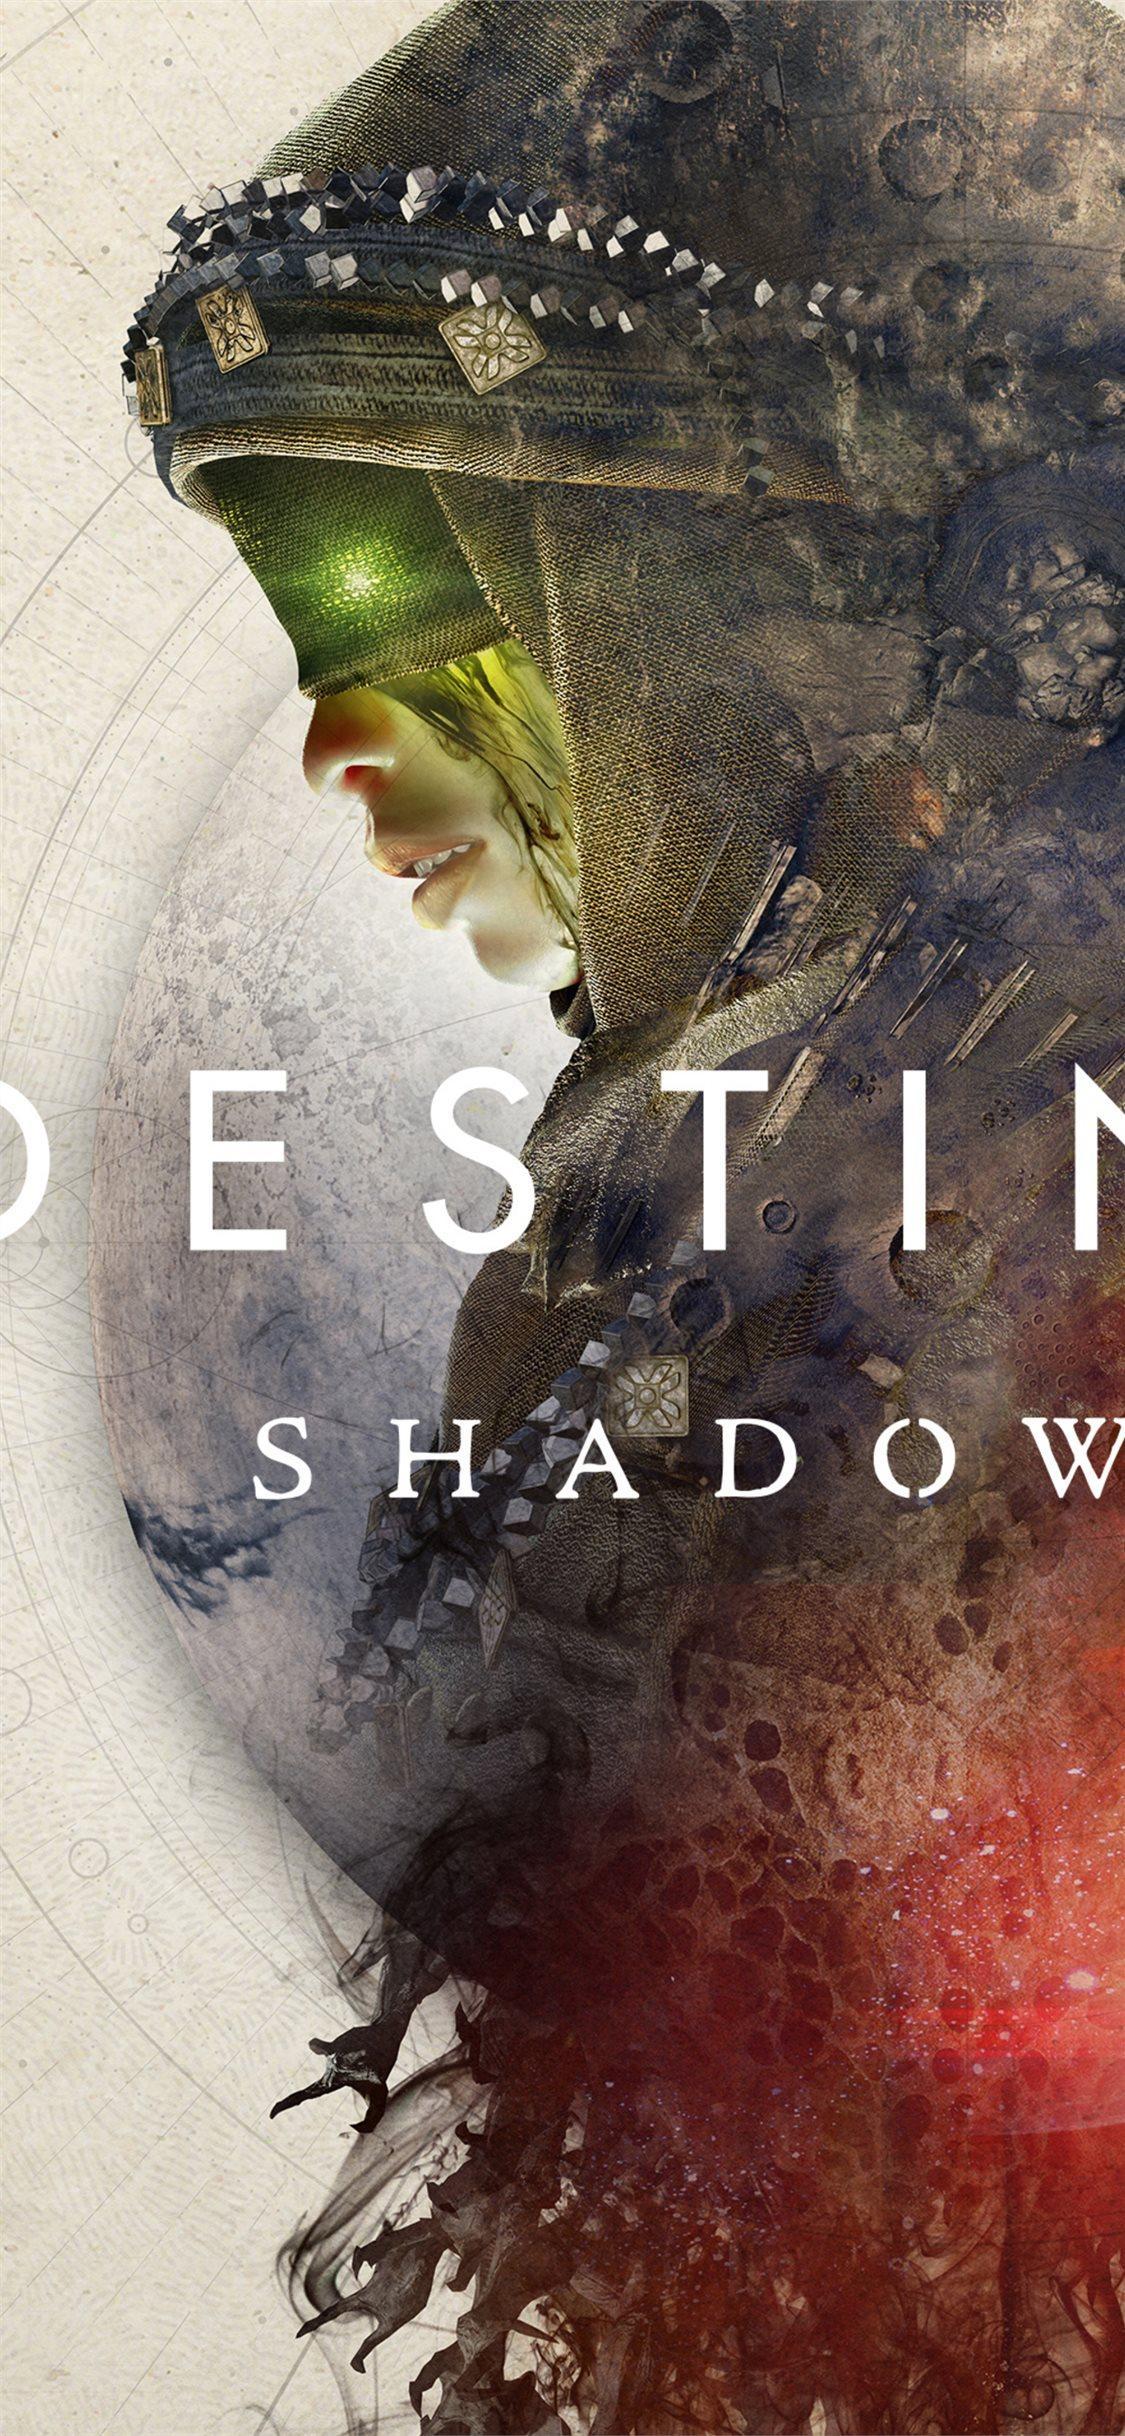 Destiny 2: Shadowkeep Wallpapers - Wallpaper Cave